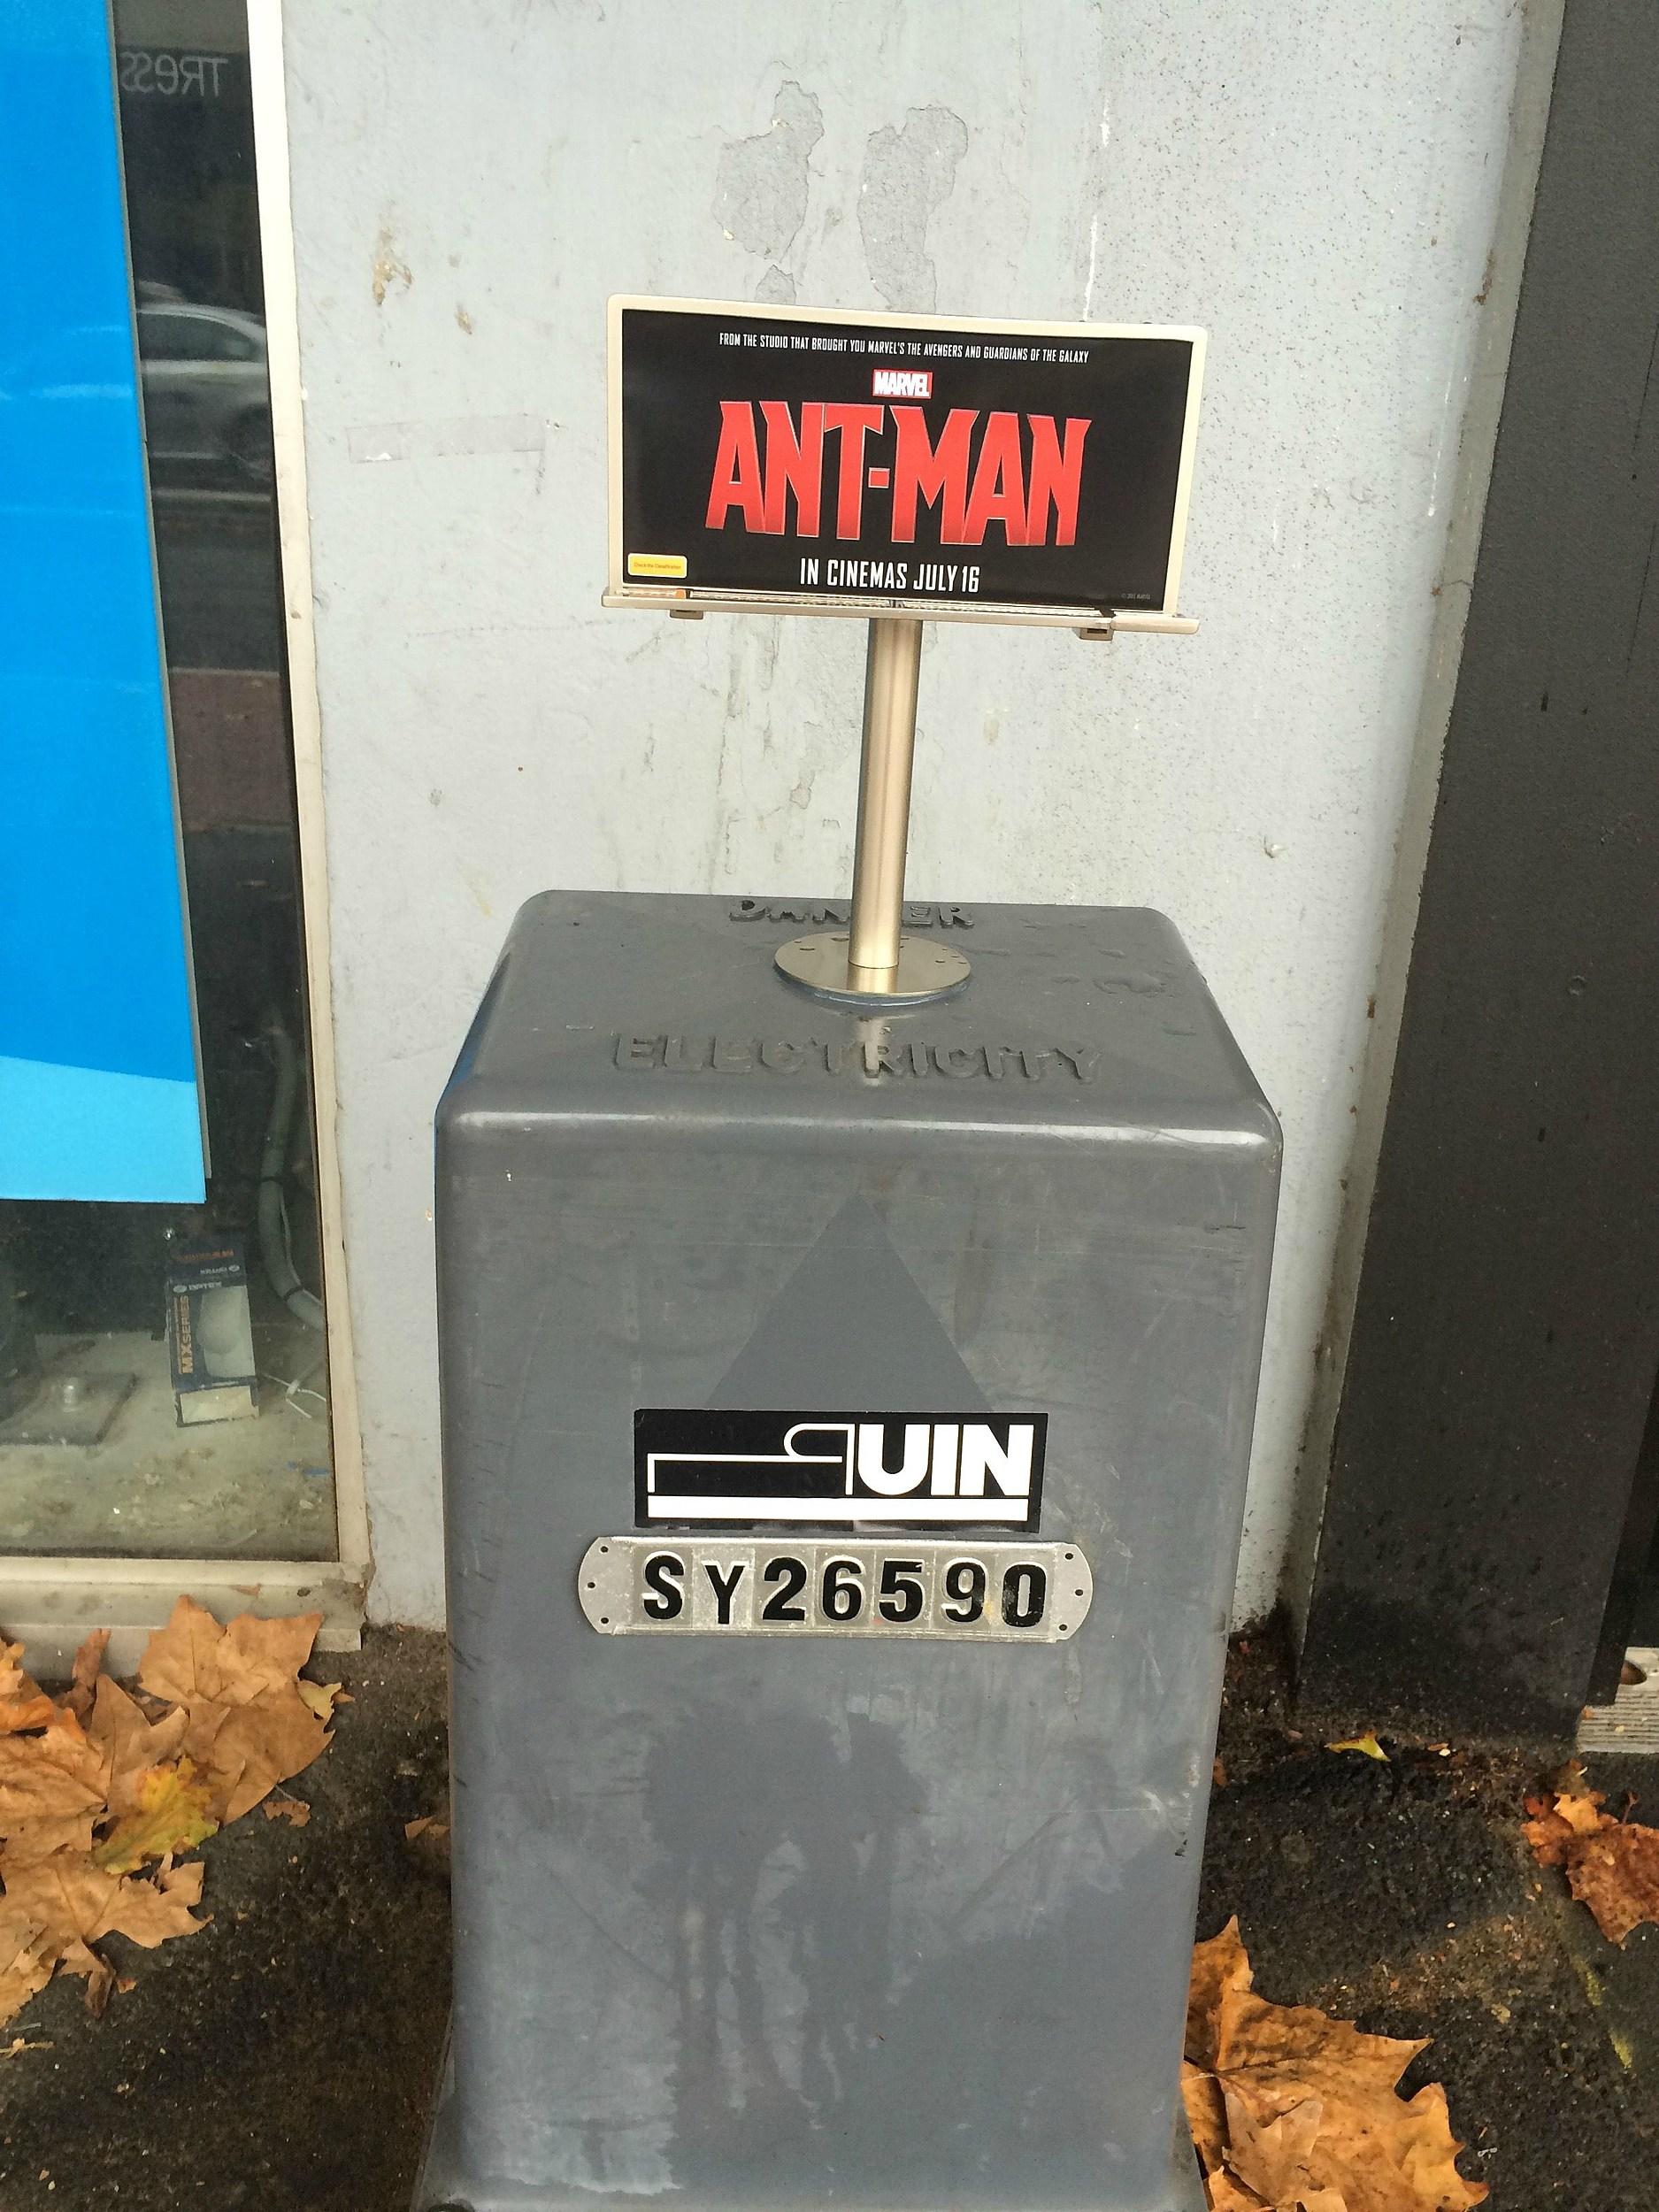 Tiny Ant Man billboard